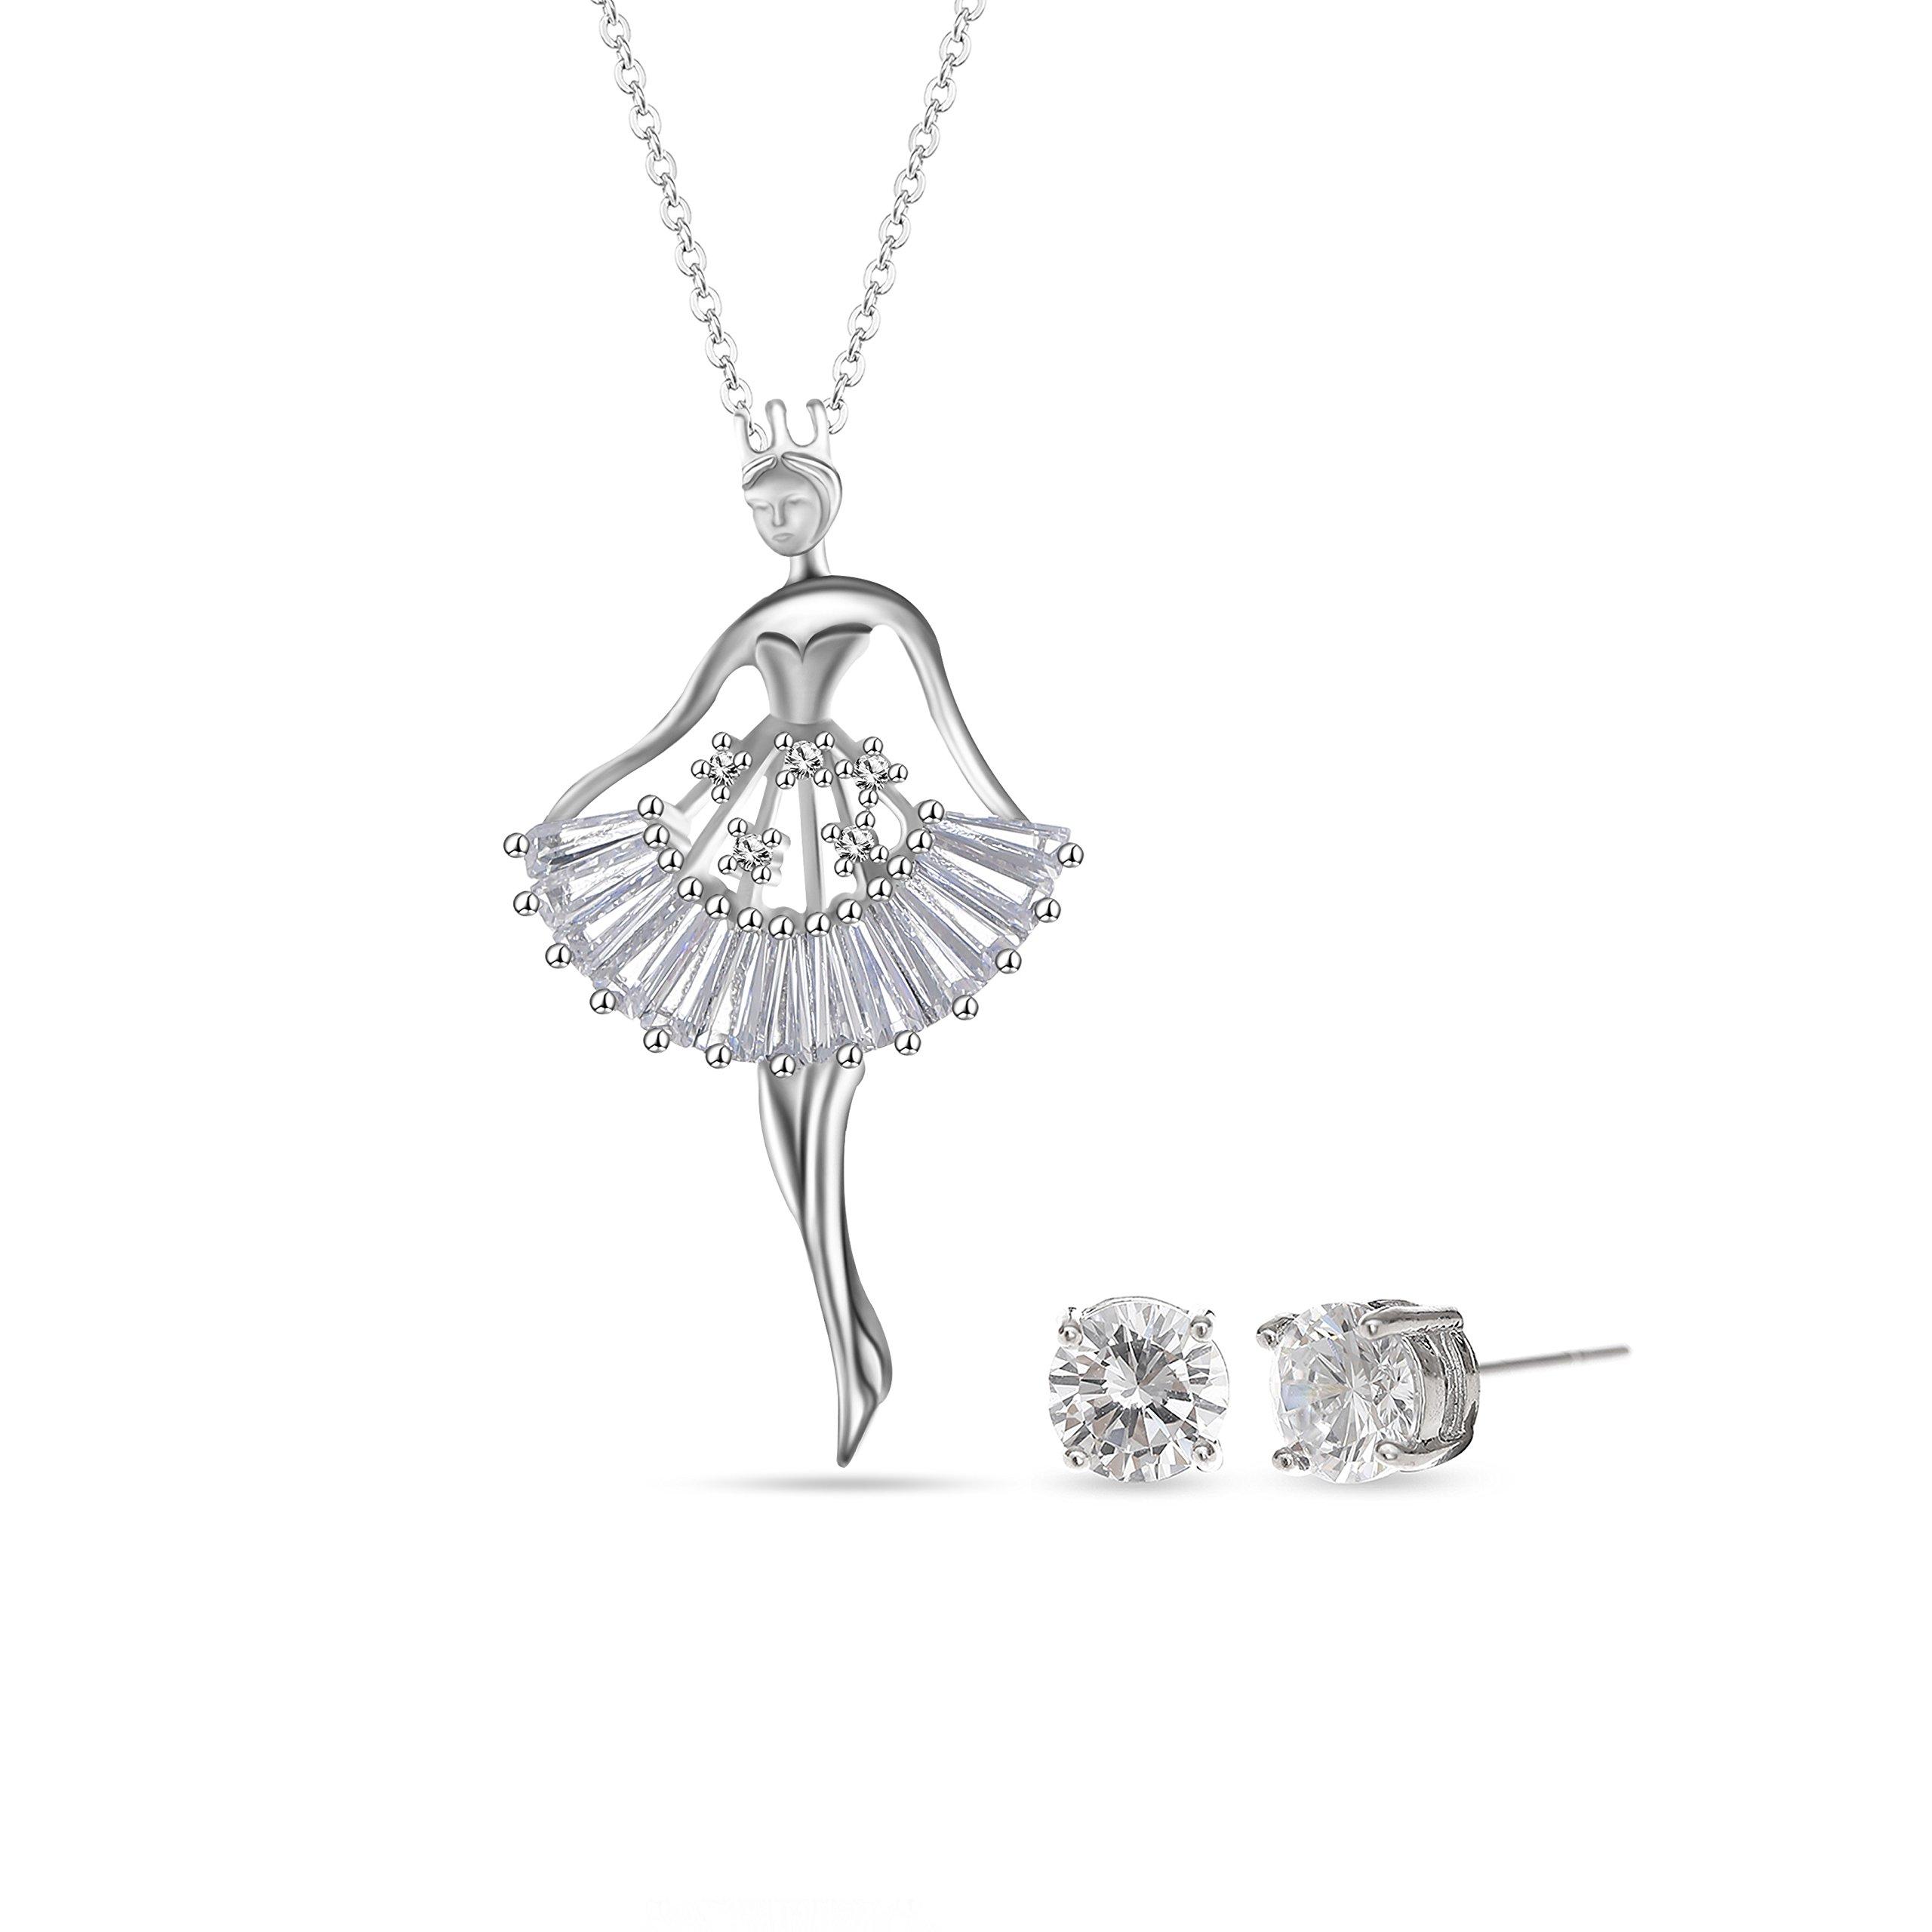 MYKEA Elegant Jewelry Set for Women 18K White Gold Ballerina Girl Pendant Necklace with Cubic Zirconia Stud Earrings for Teen Girls Jewelry by MYKEA (Image #7)